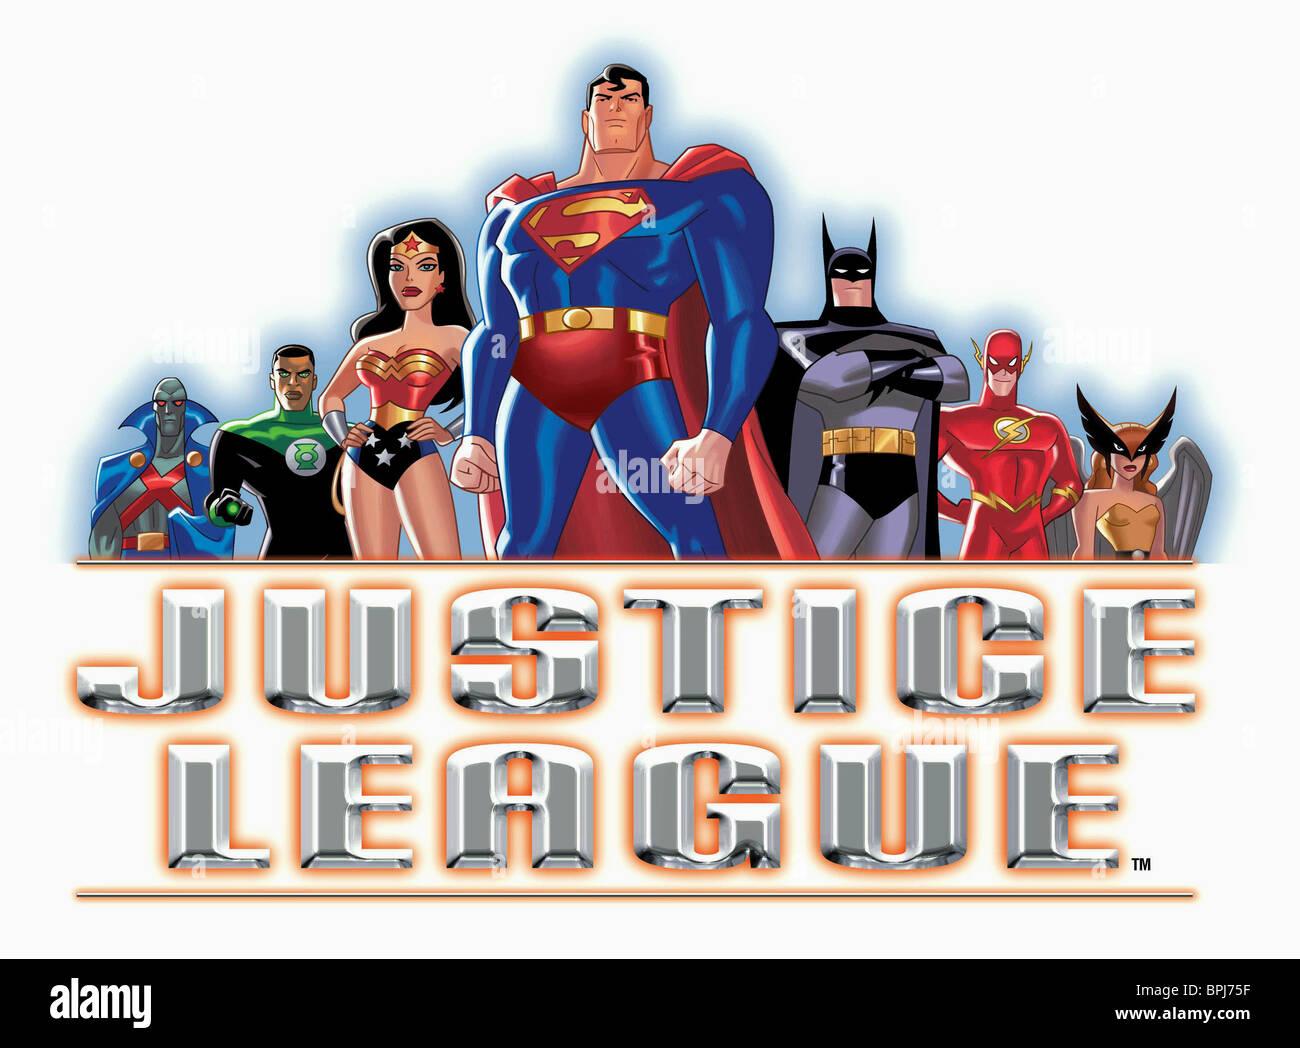 THE MARTIAN MANHUNTER GREEN LANTERN II WONDER WOMAN SUPERMAN BATMAN THE FLASH & HAWKGIRL JUSTICE LEAGUE (2002) - Stock Image